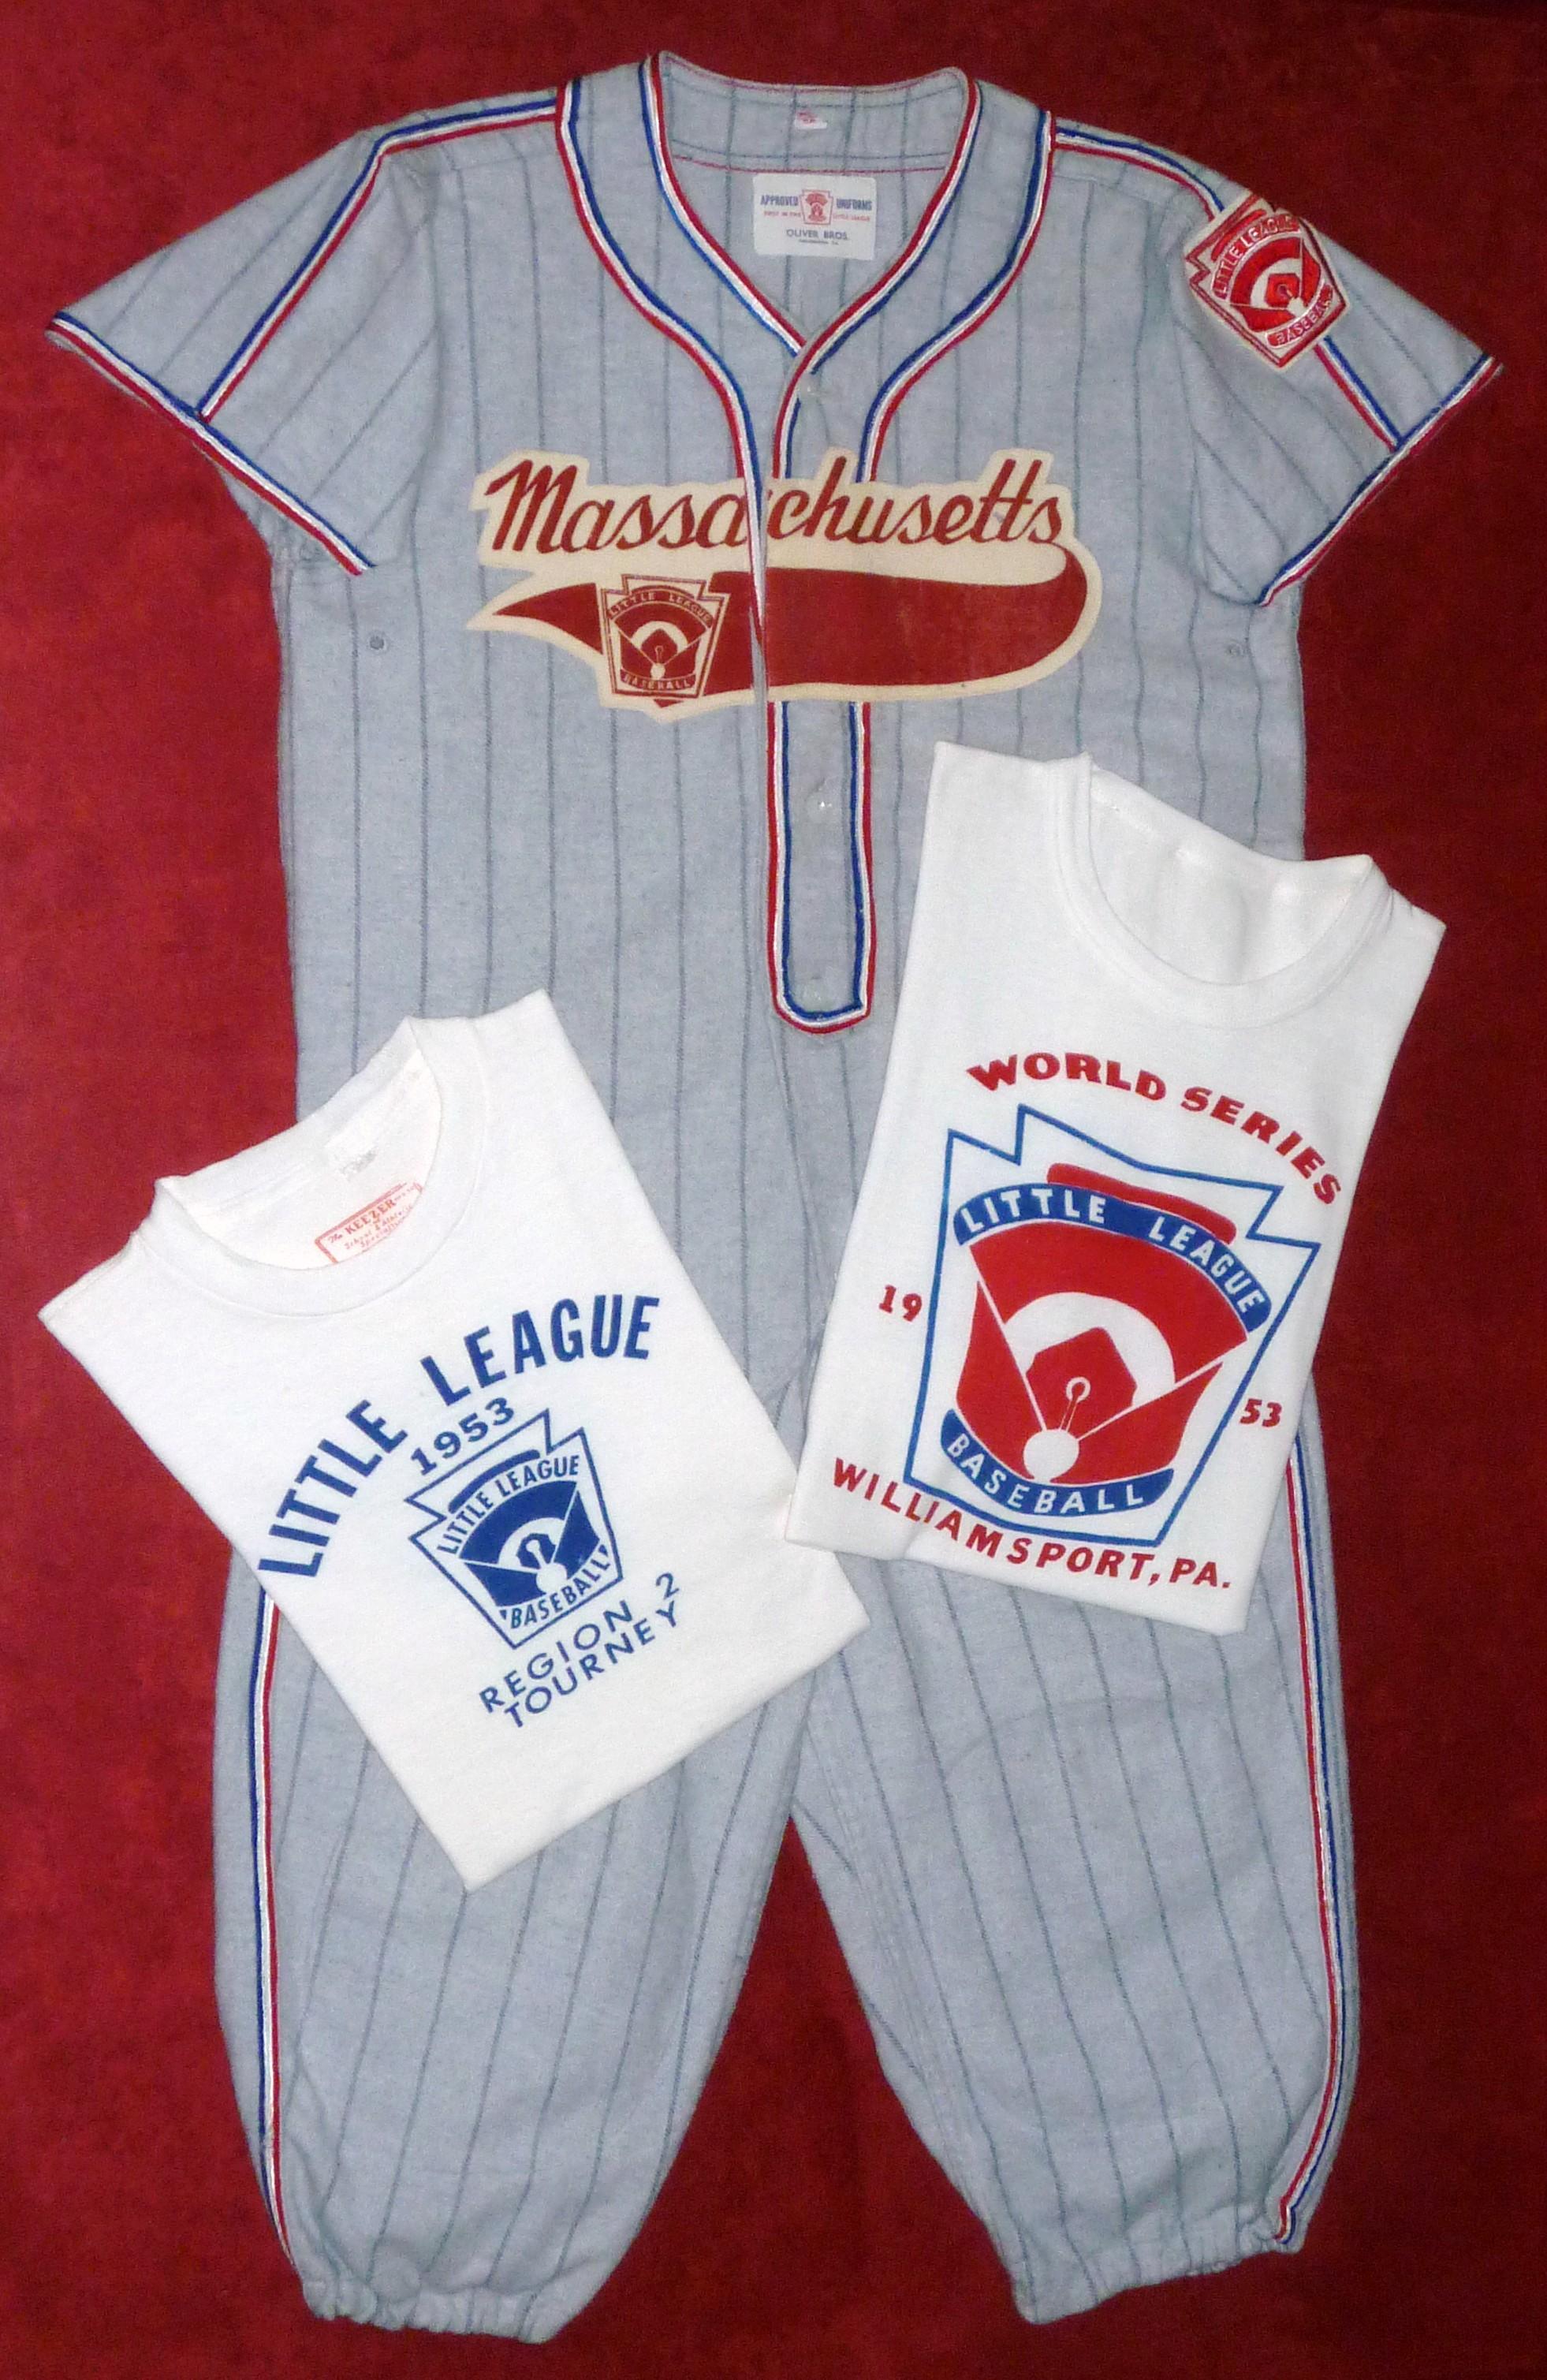 My Father's Little League World Series Uniform - 1953